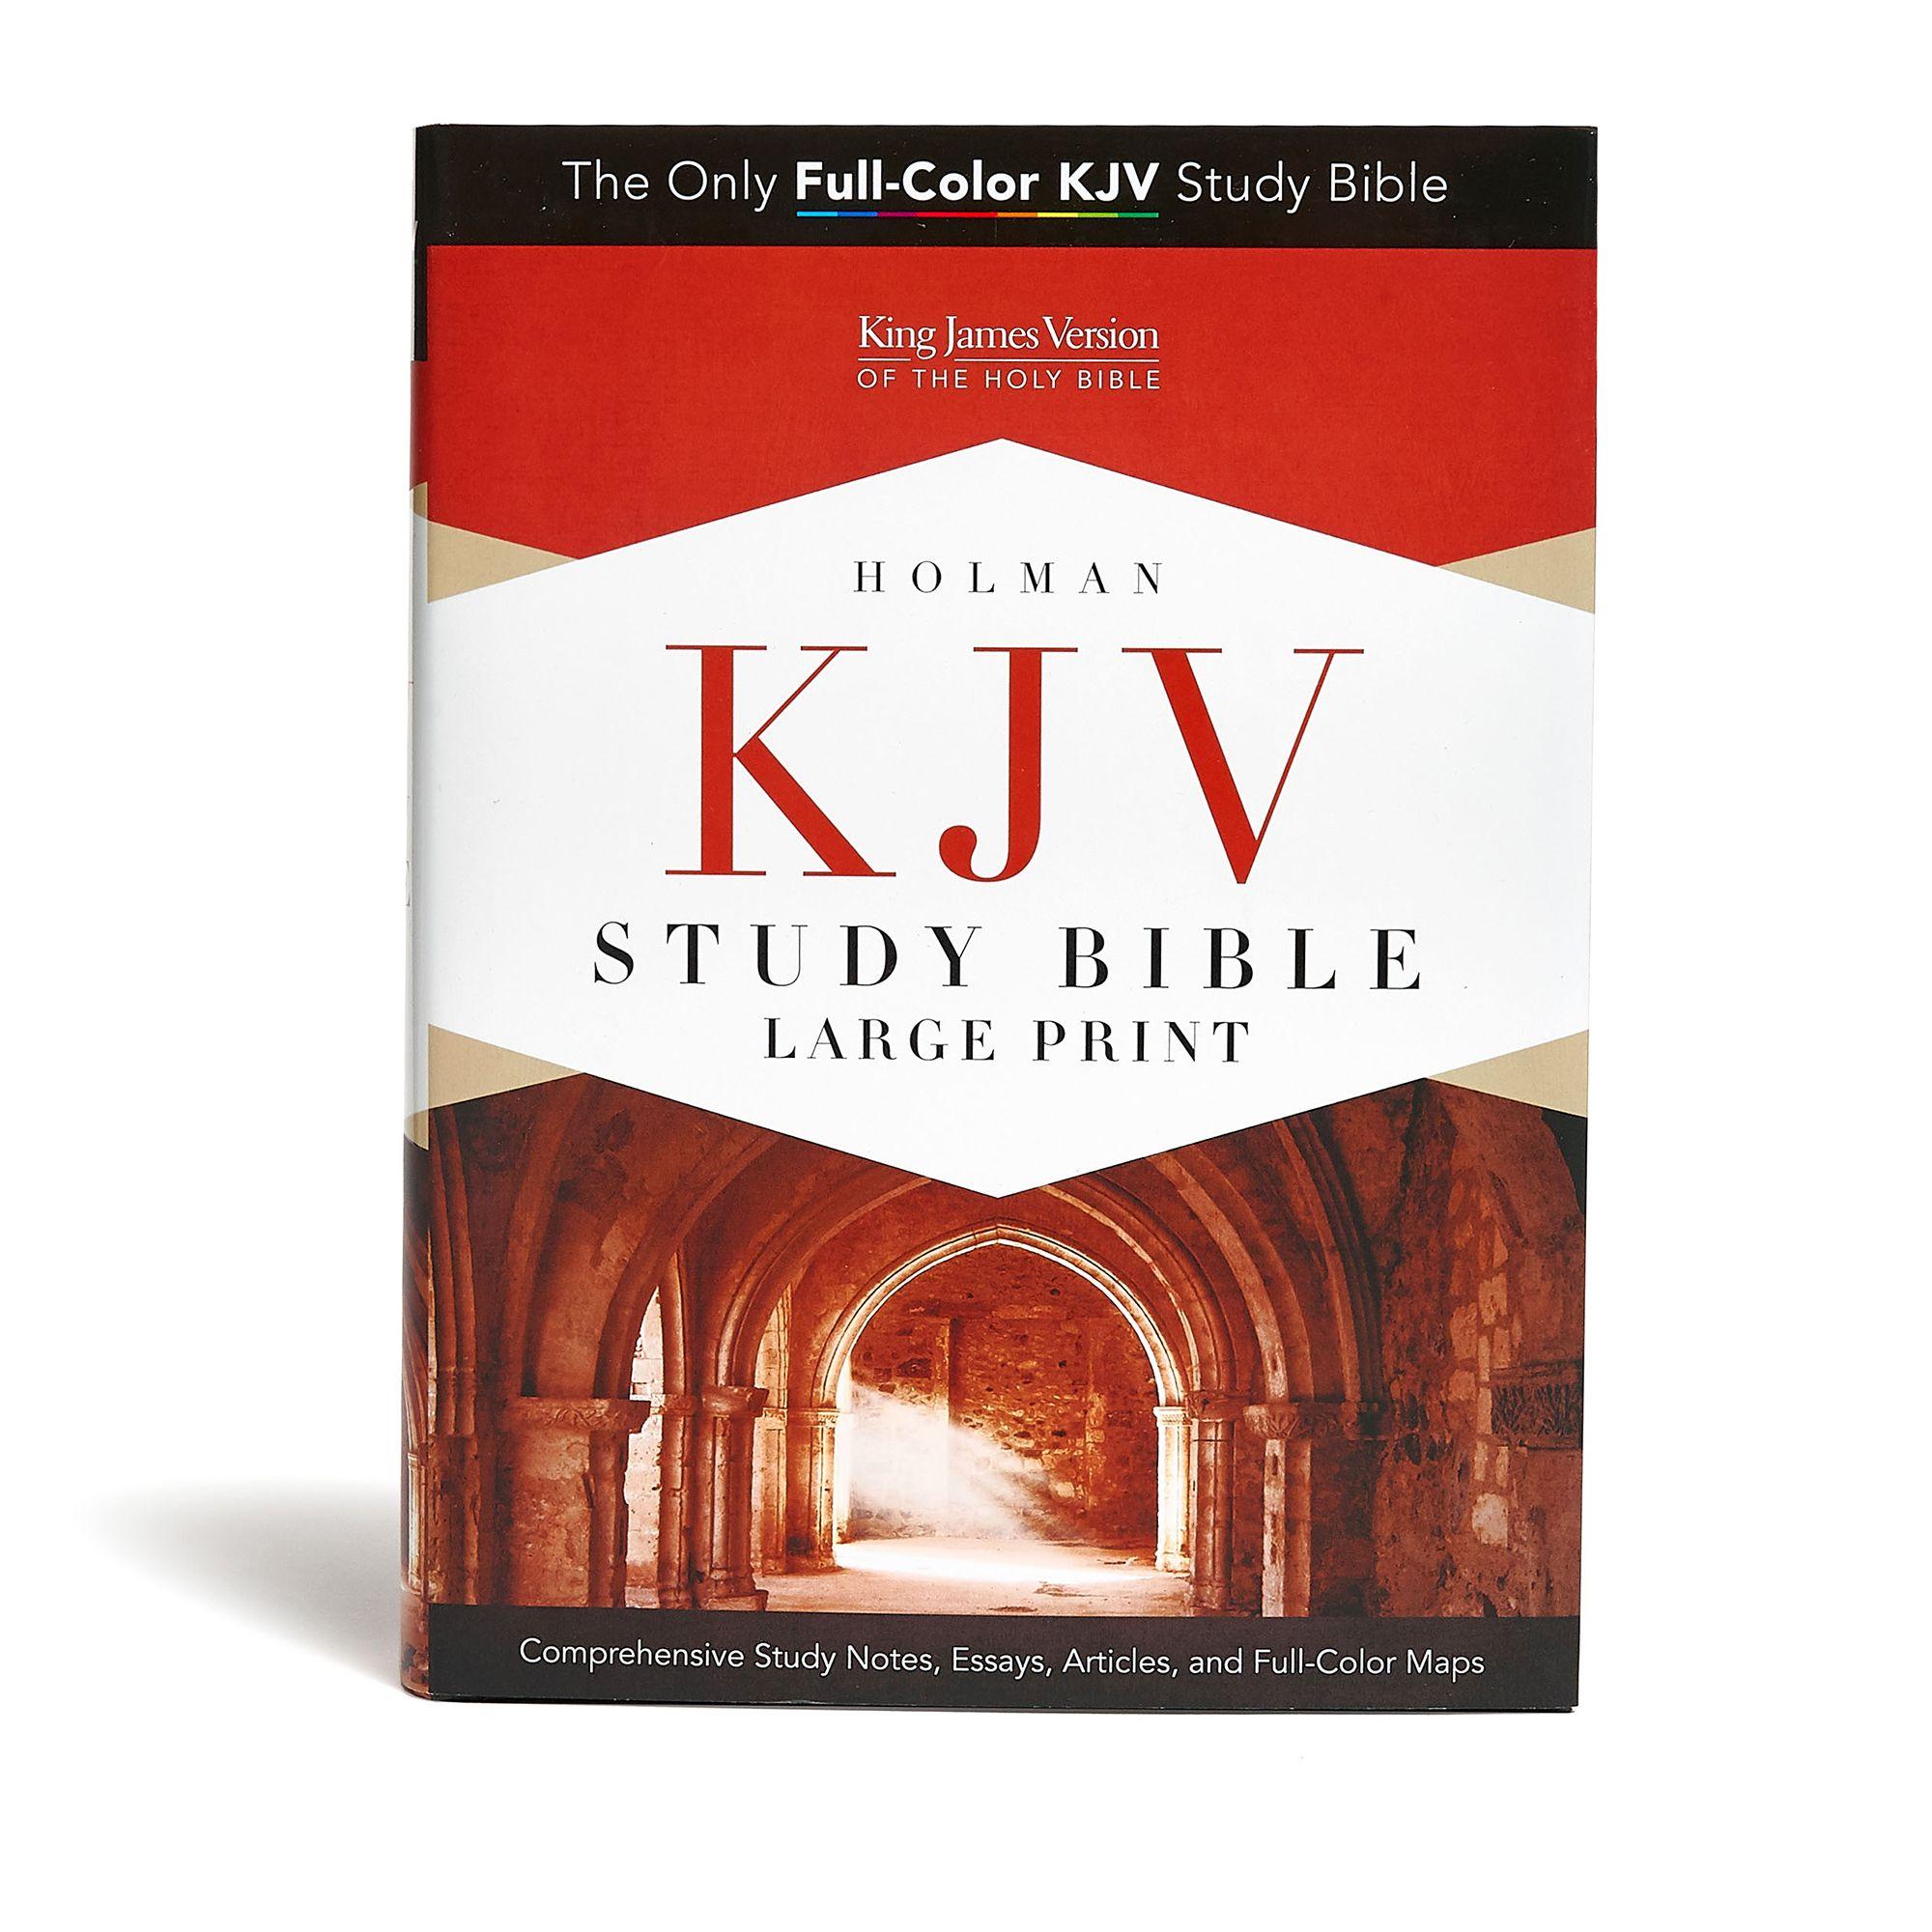 KJV Study Bible Large Print Edition, Hardcover